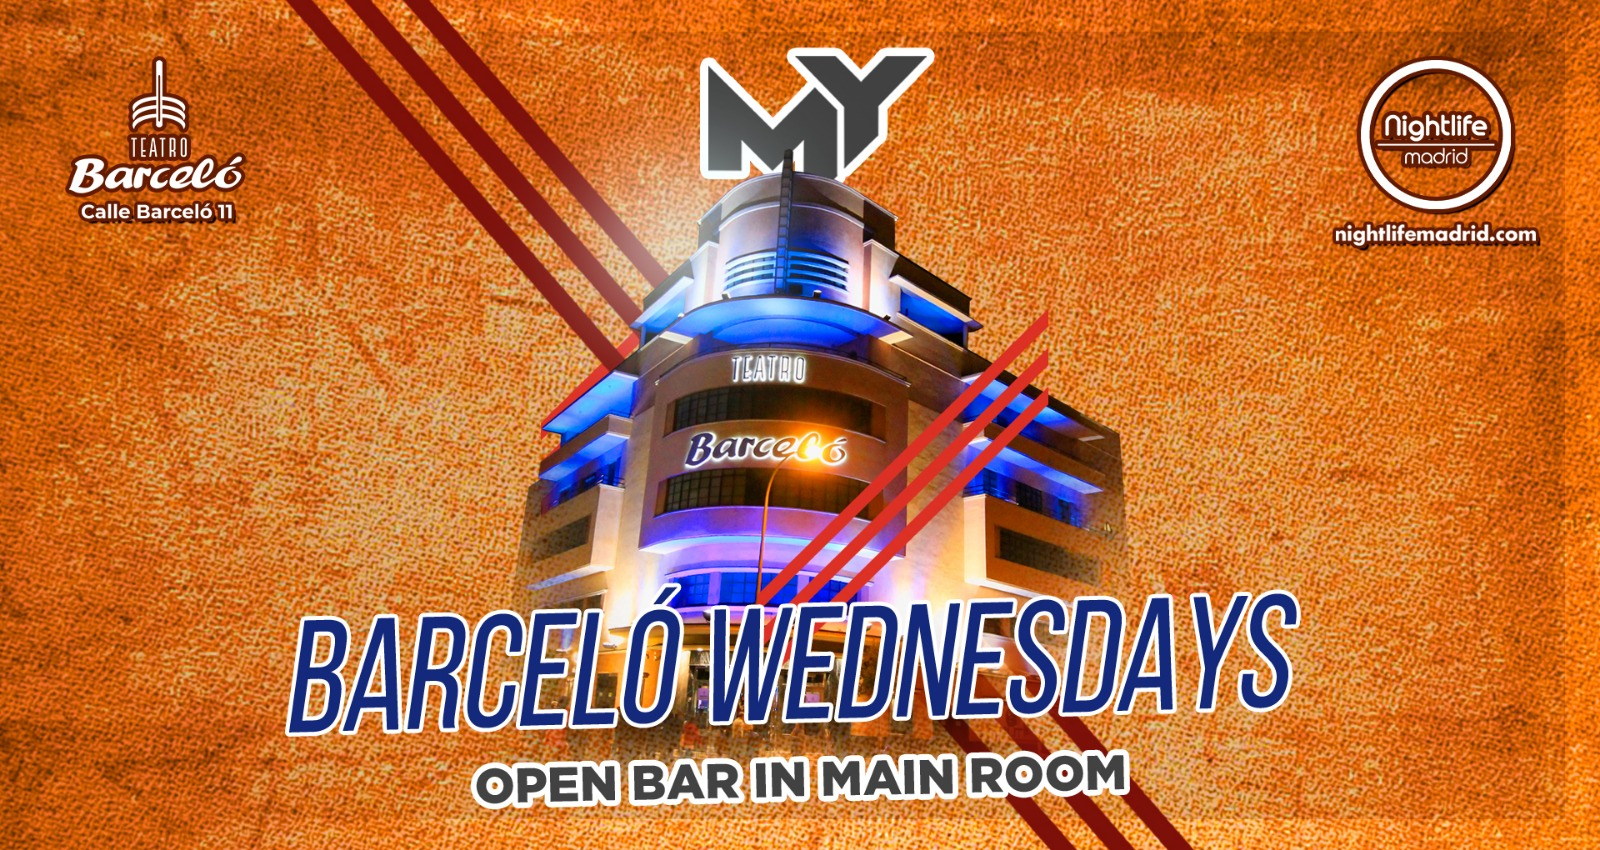 Barceló Wednesdays - Virtual Nightlife Madrid